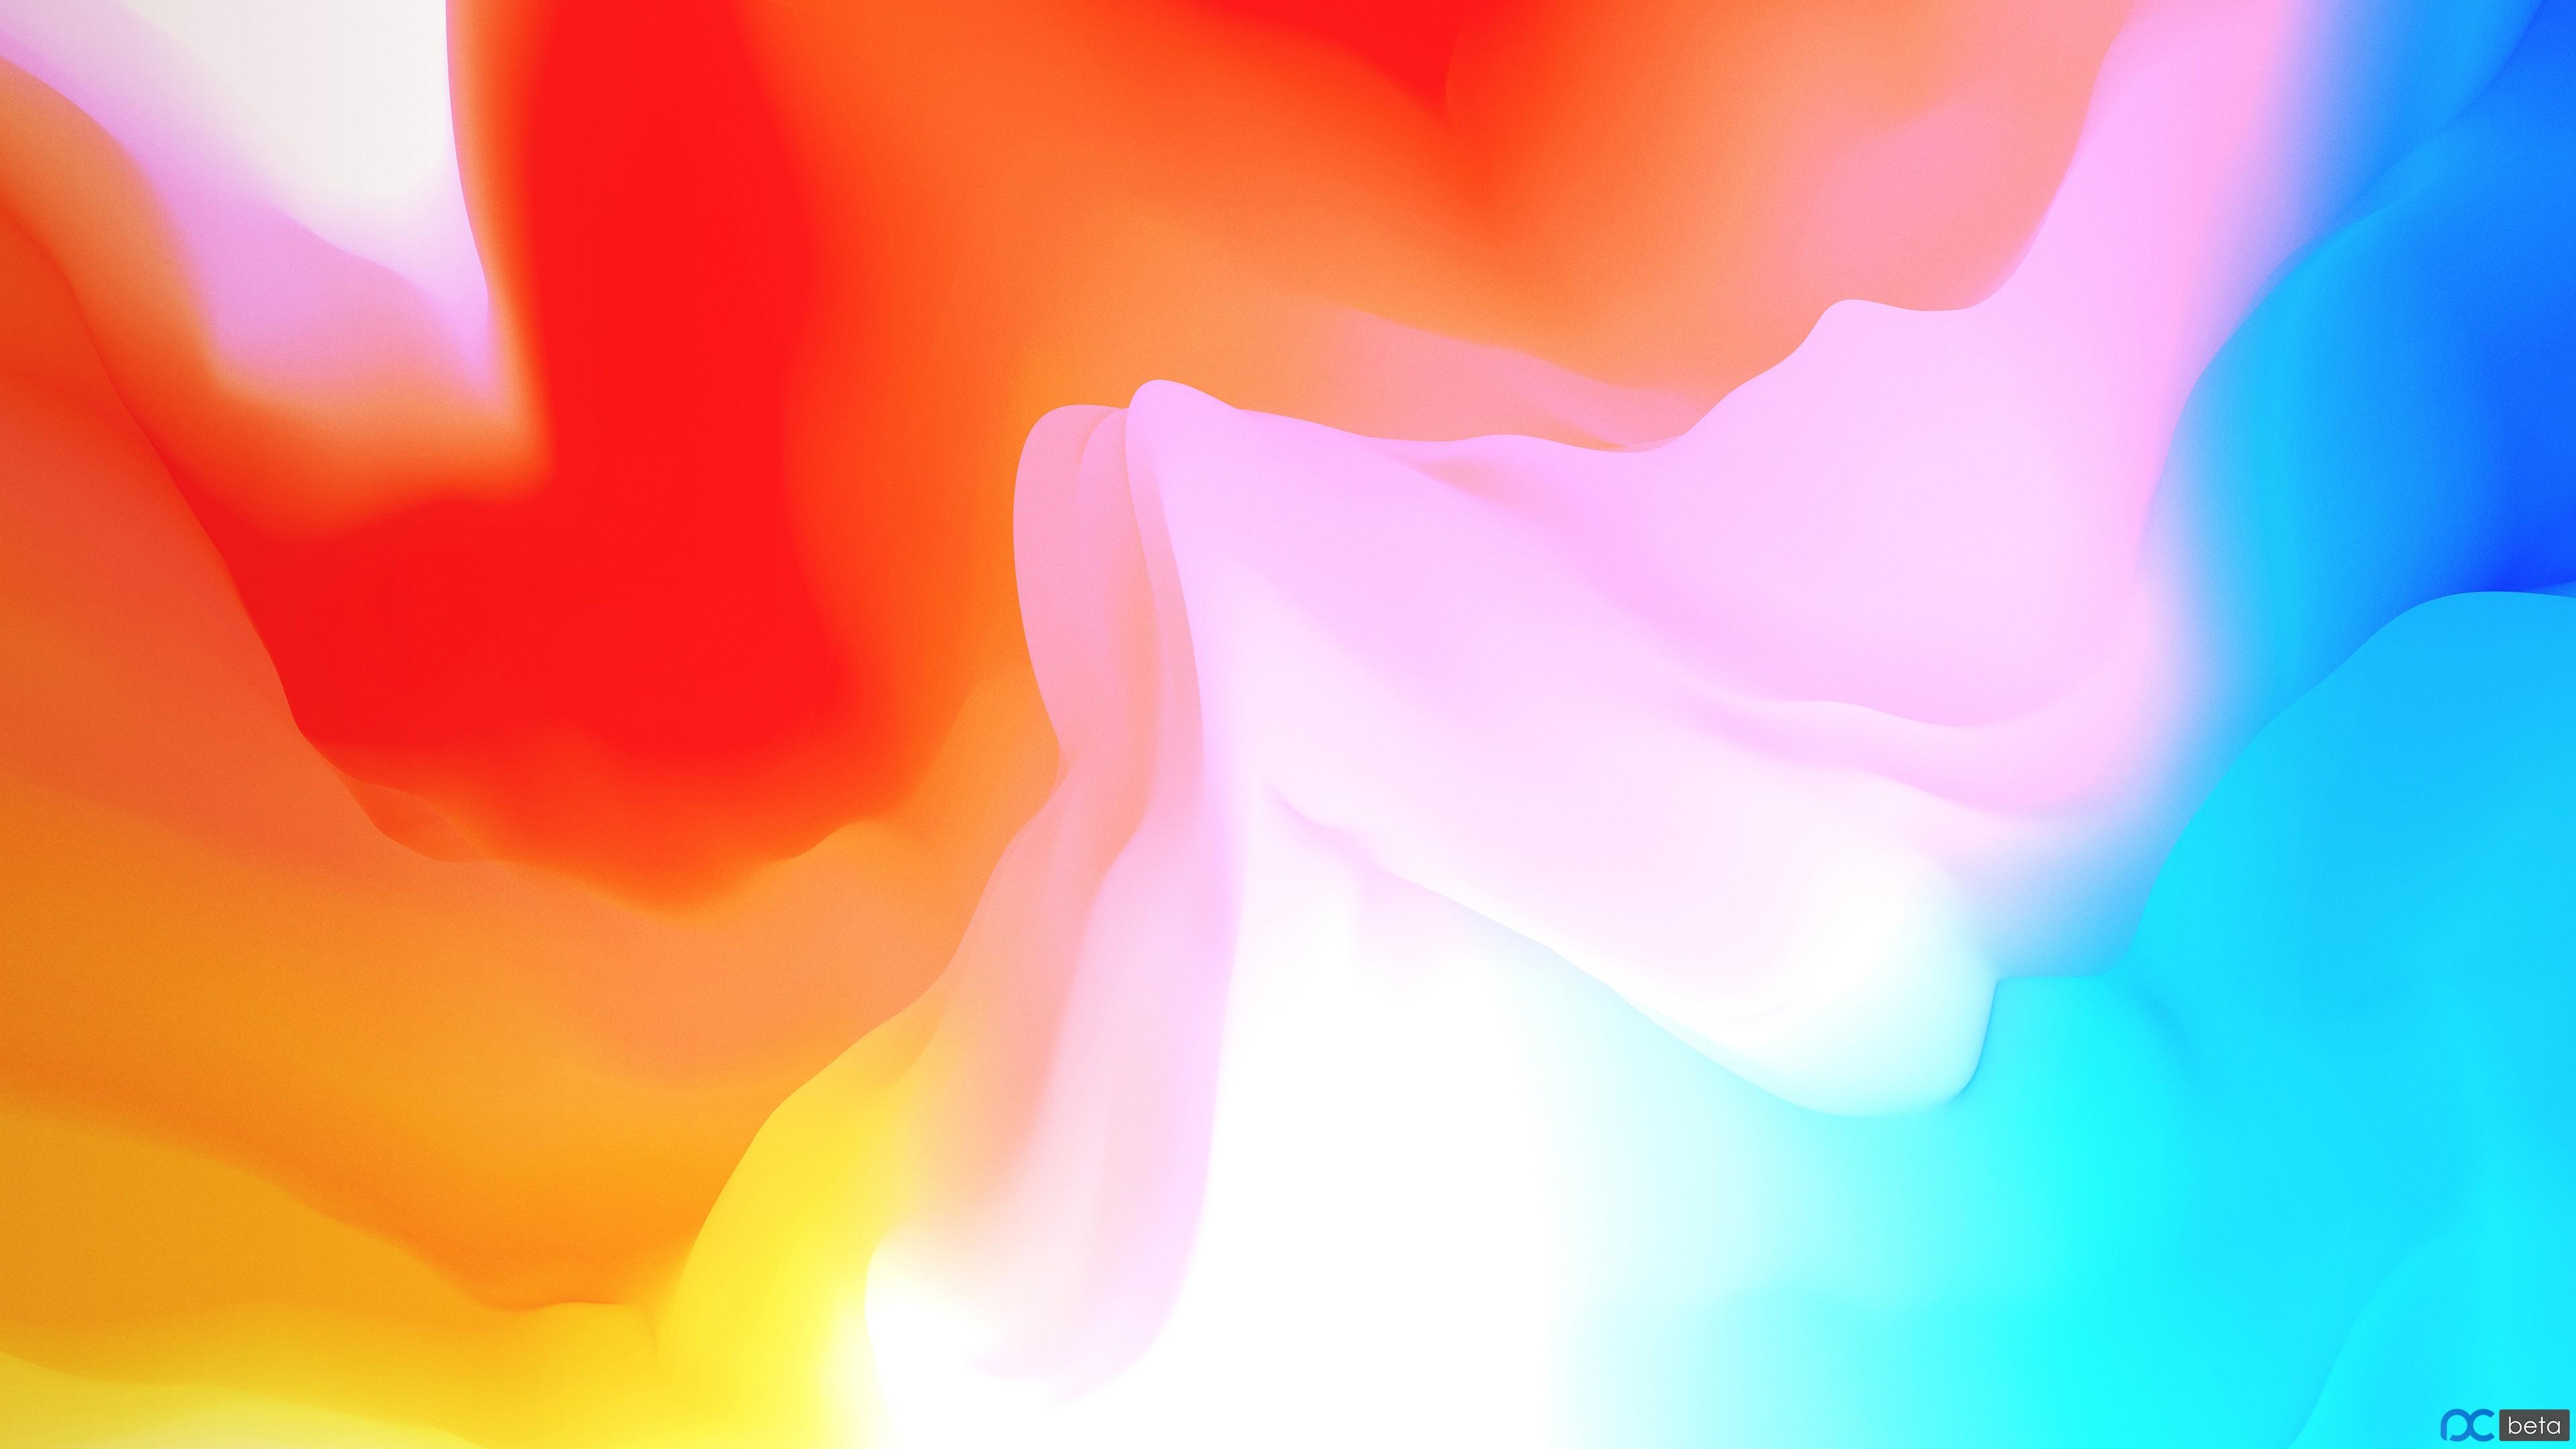 abstract-3840x2160-oneplus-6t-4k-21842.jpg